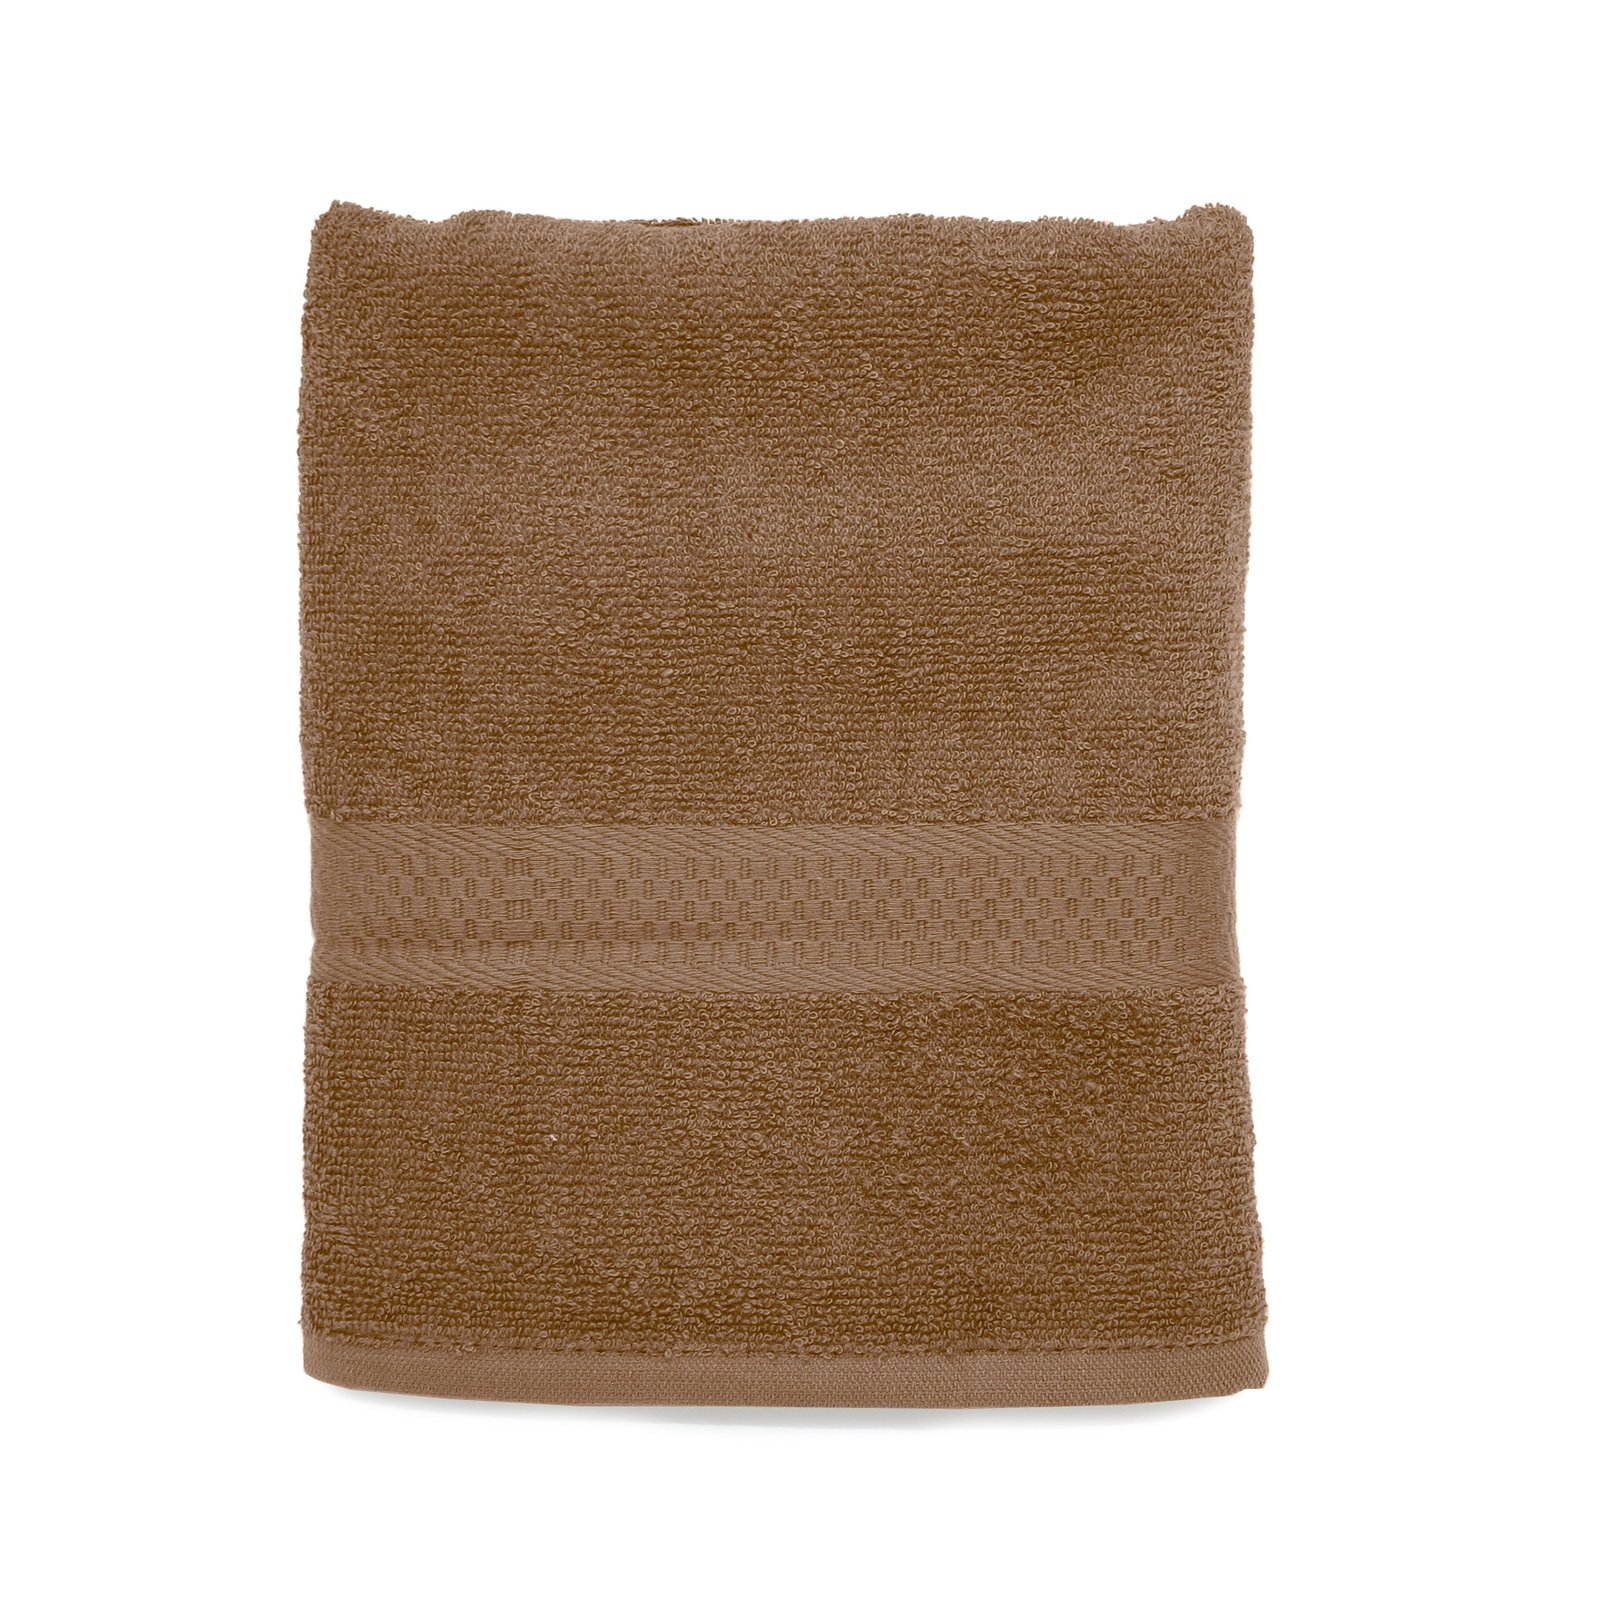 Полотенце банное Spany, 21311318179, махровое, коричневый, 50 х 90 см полотенце банное fiesta arabesca 50 90 см